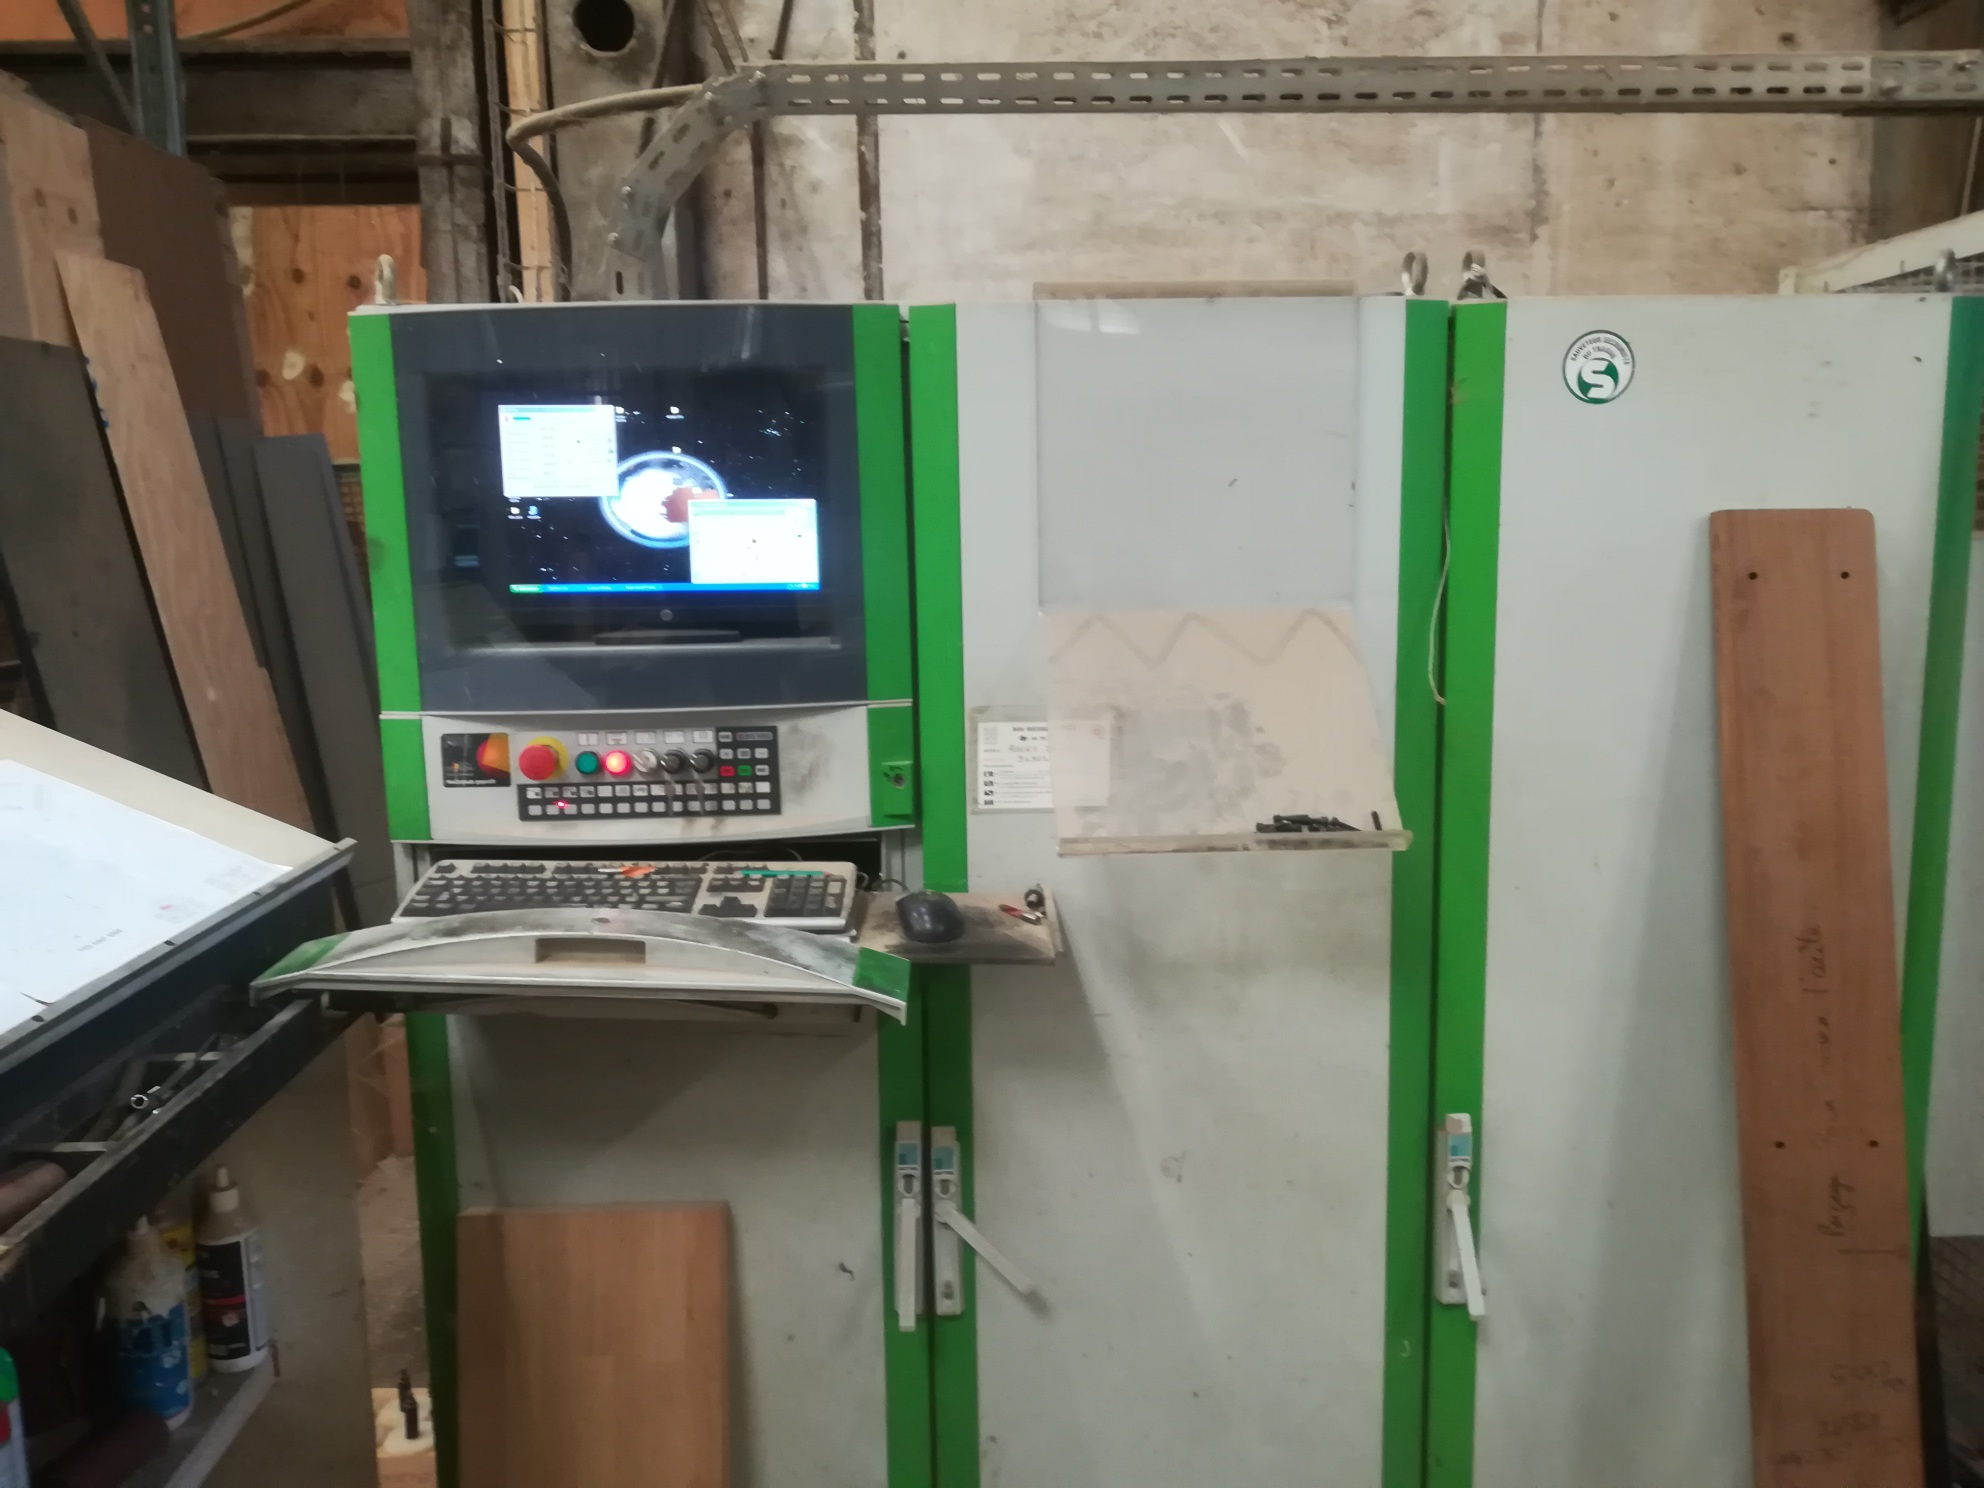 Centre d'usinage Biesse Rover 37 ATS XL1